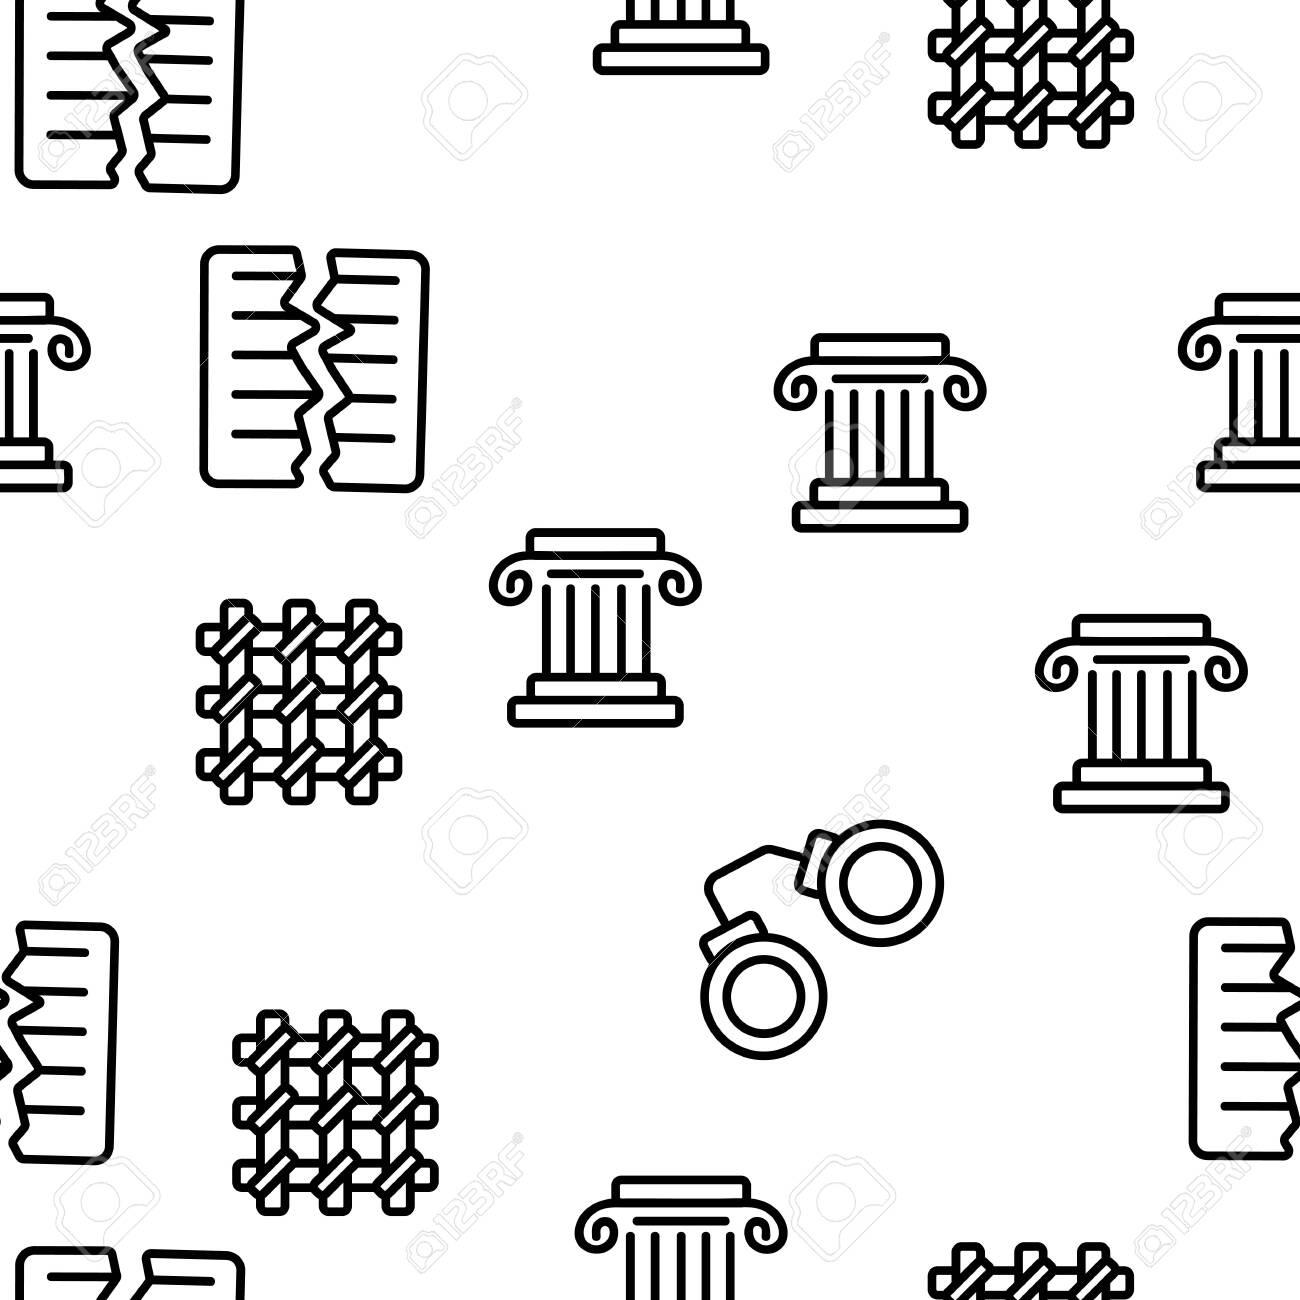 Judgement, Court Process Vector Seamless Pattern Contour Illustration - 129205708